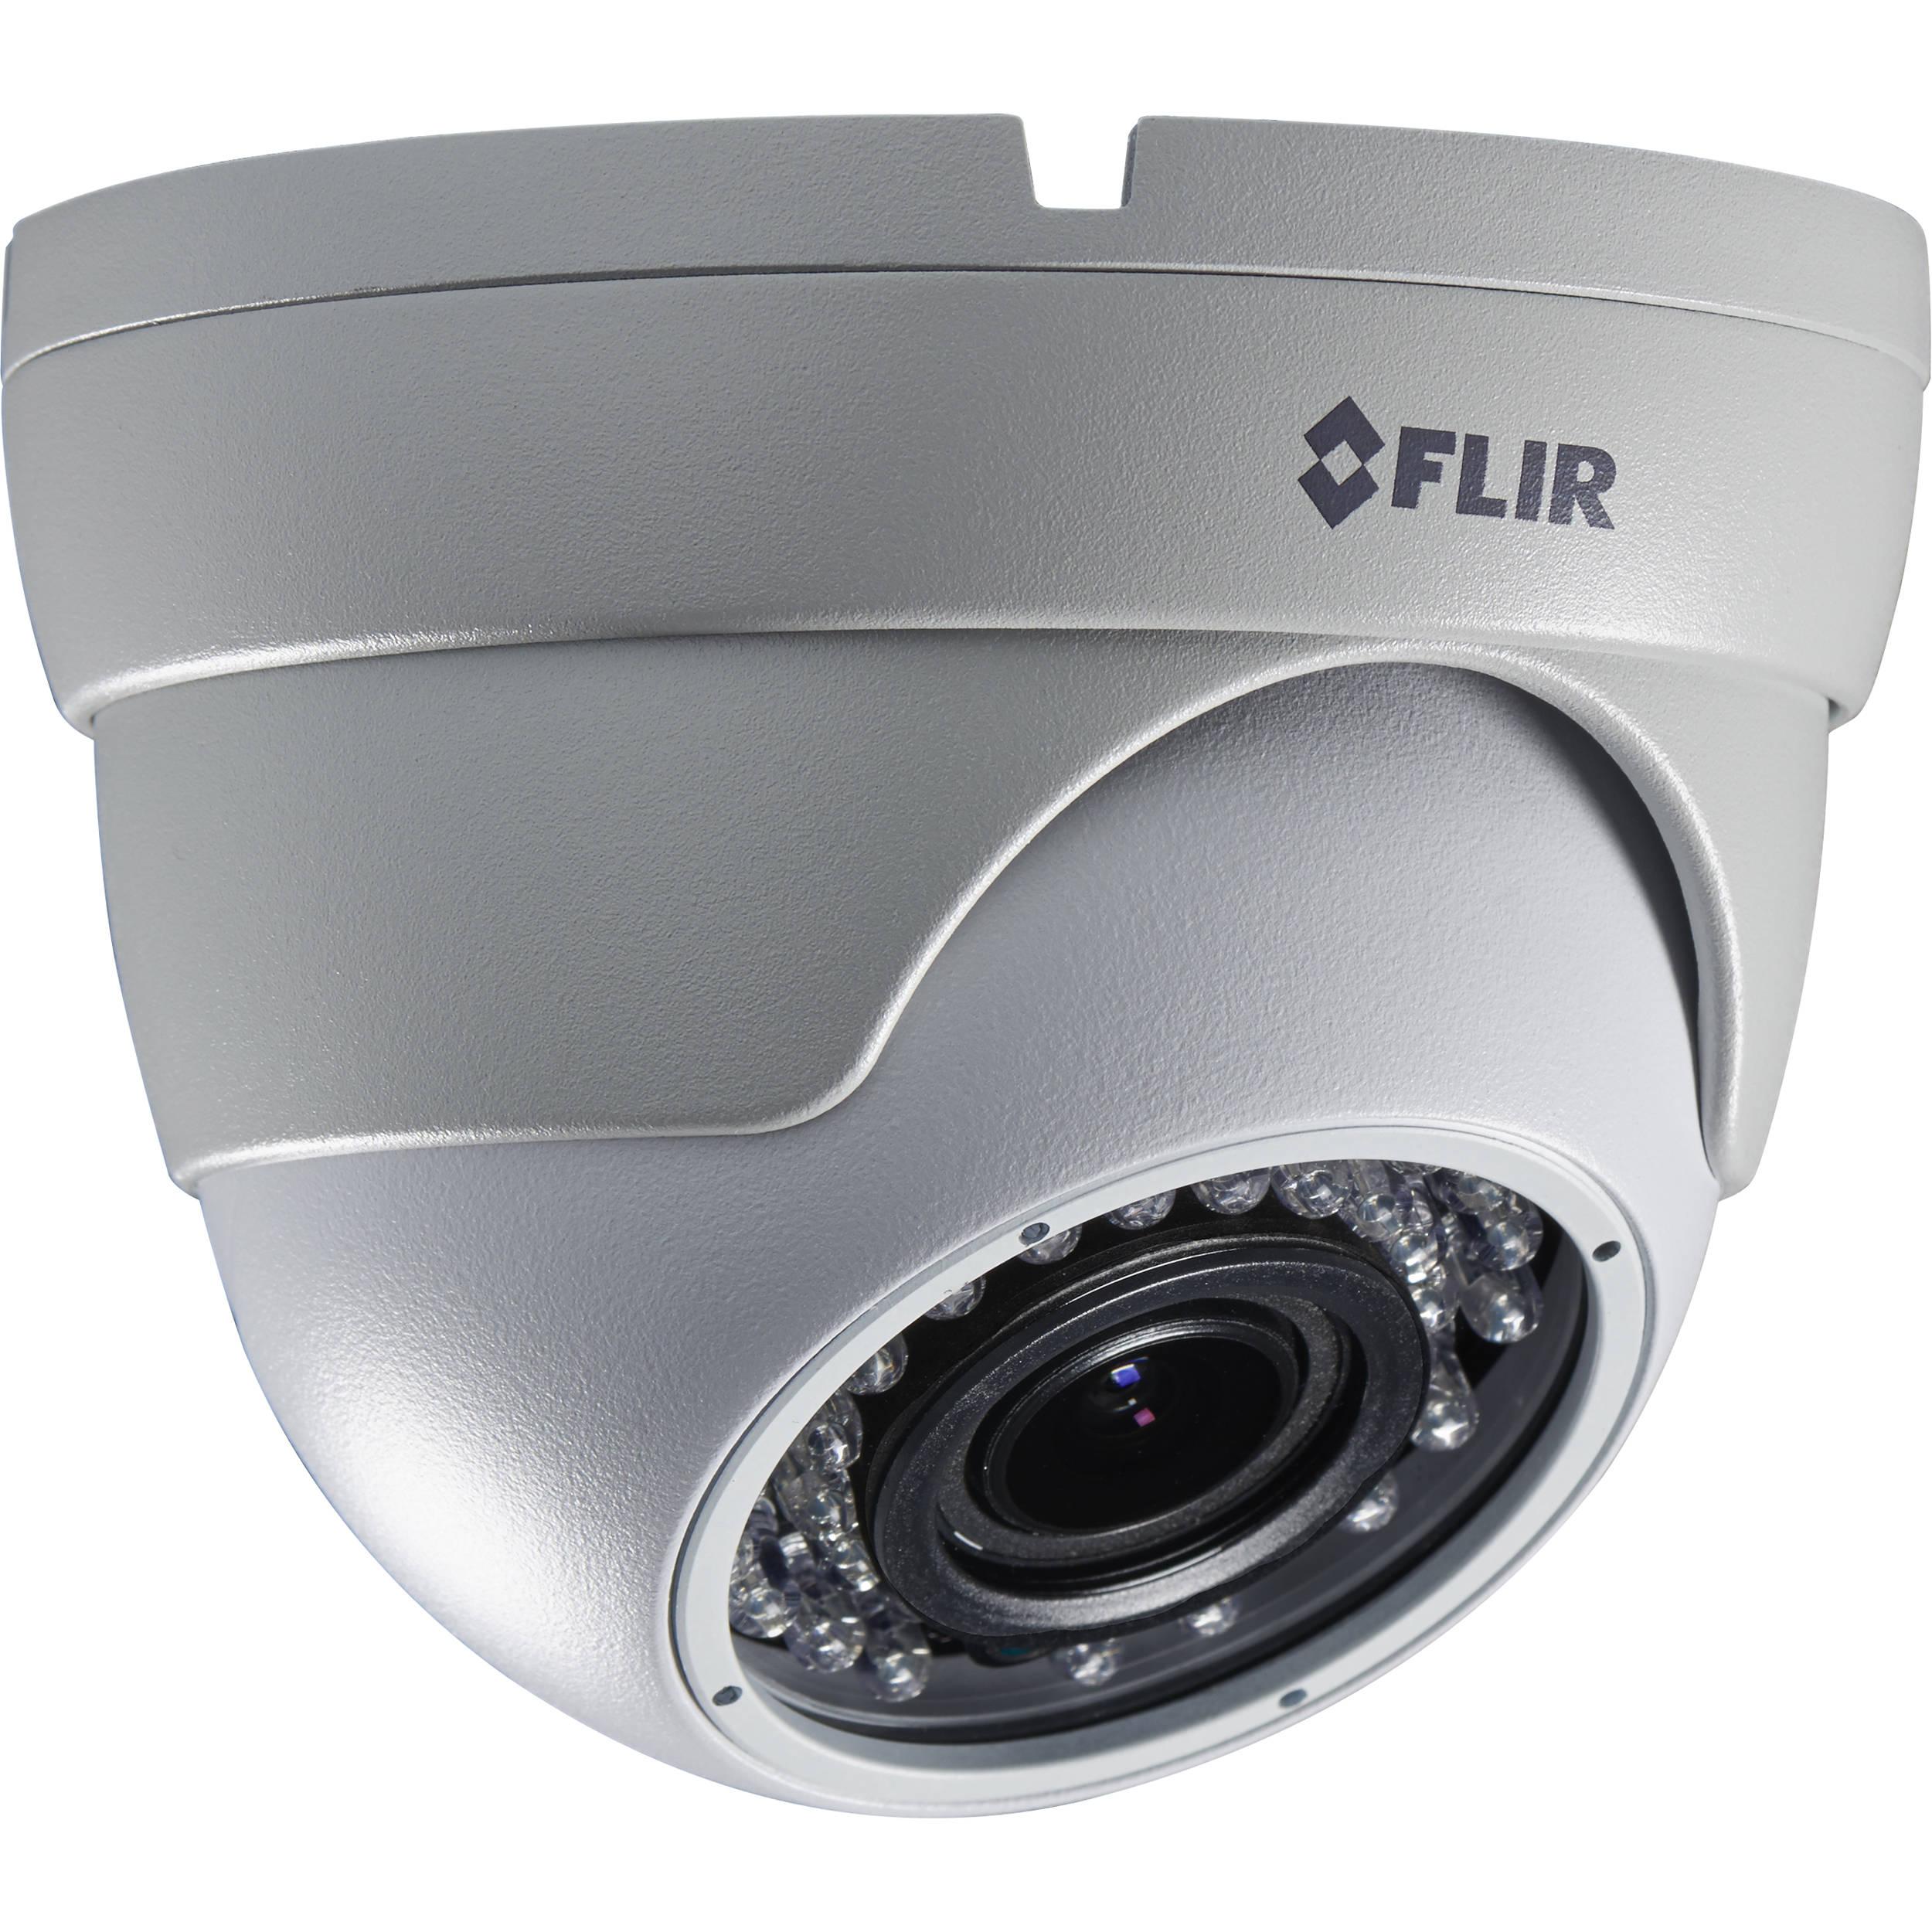 Flir Mpx Series 1 3mp Outdoor Hd Cvi Dome Camera C234ec B Amp H